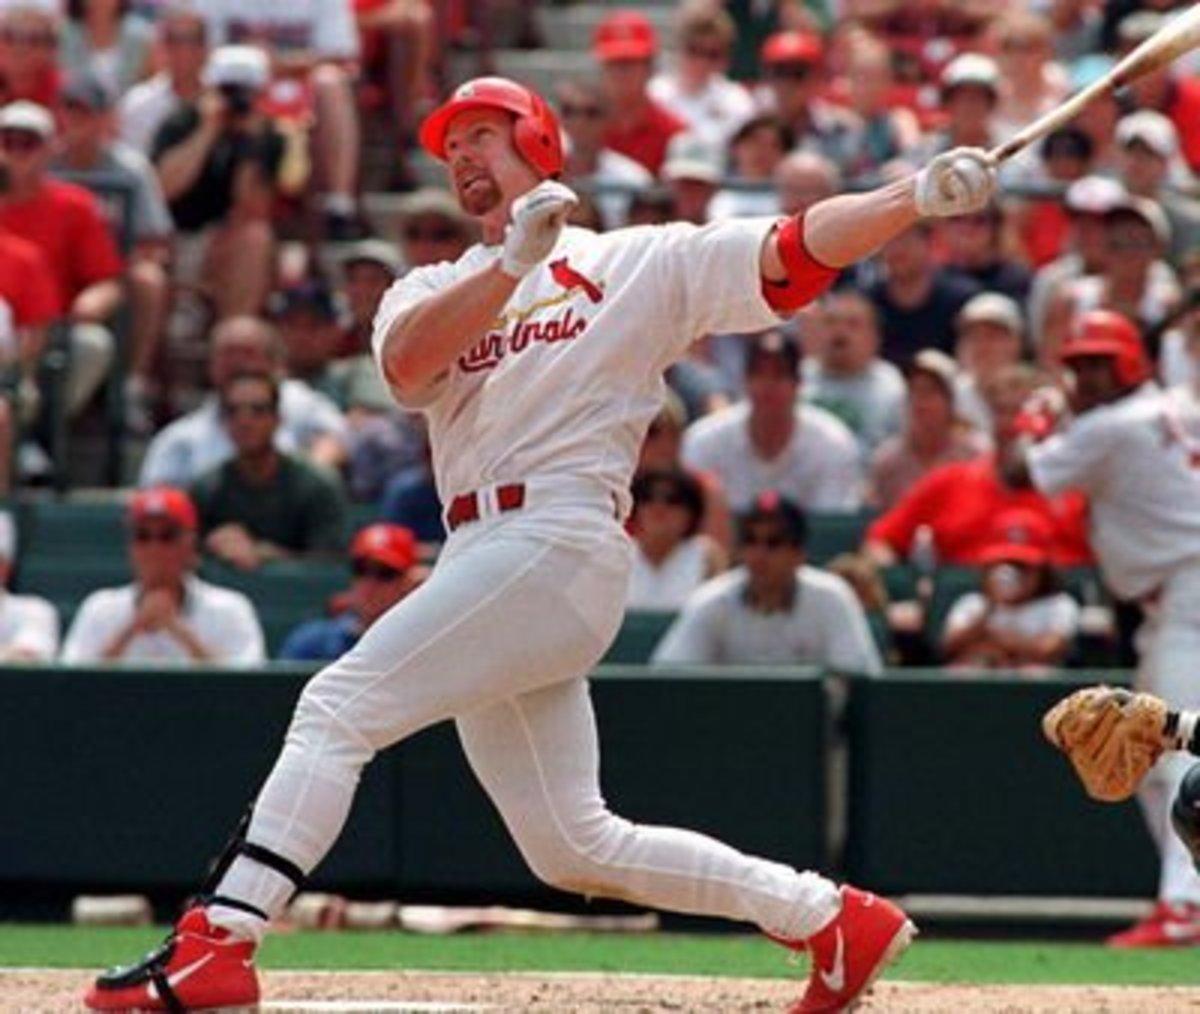 Mark McGwire had 4 consecutive seasons of hitting at least 50 home runs.